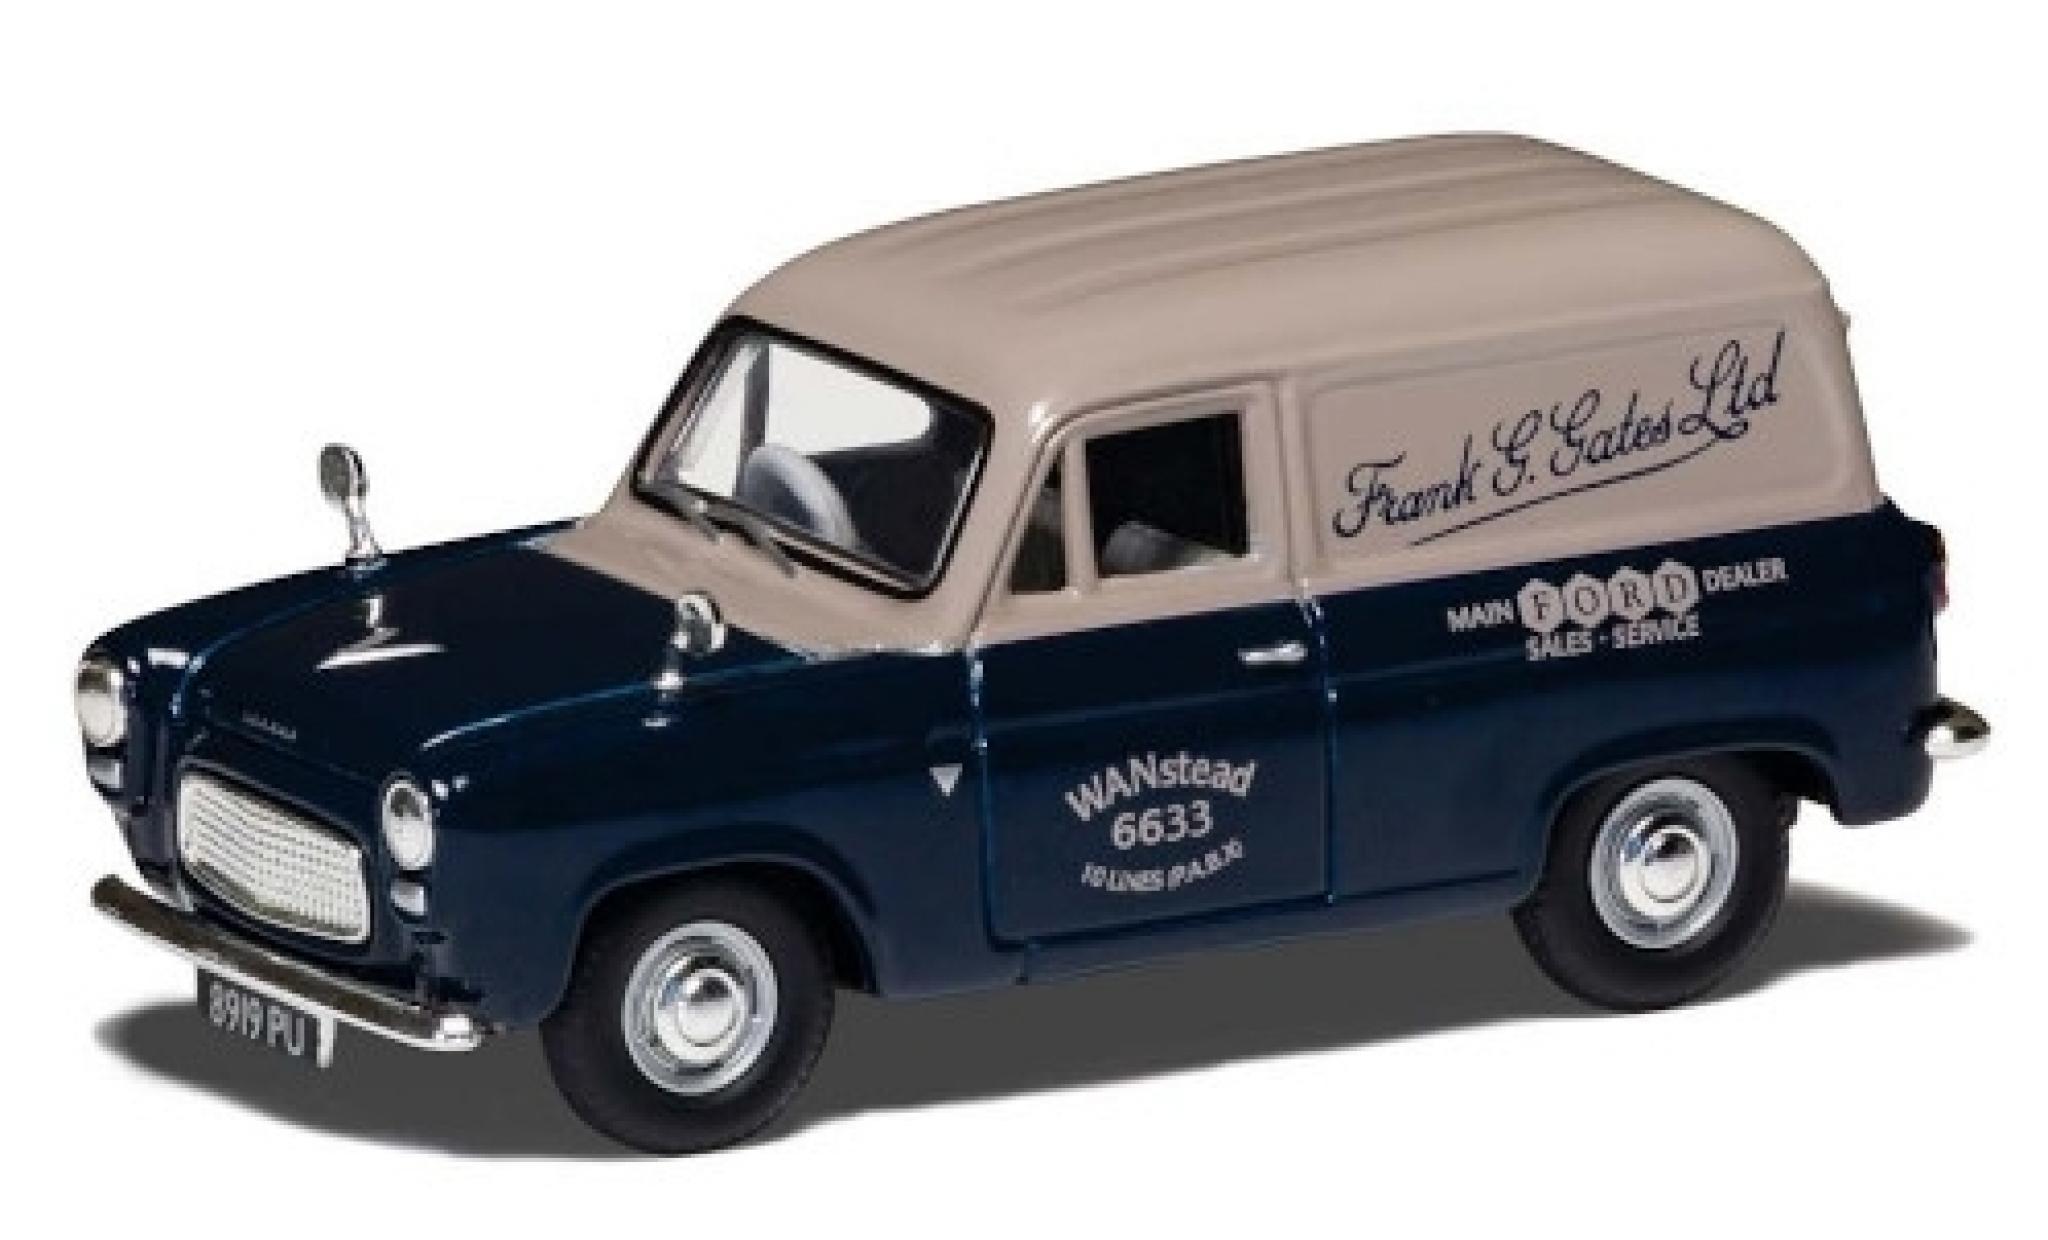 Ford 300E 1/43 Vanguards Thames Van RHD Frank G. Gates Ltd - Dealer